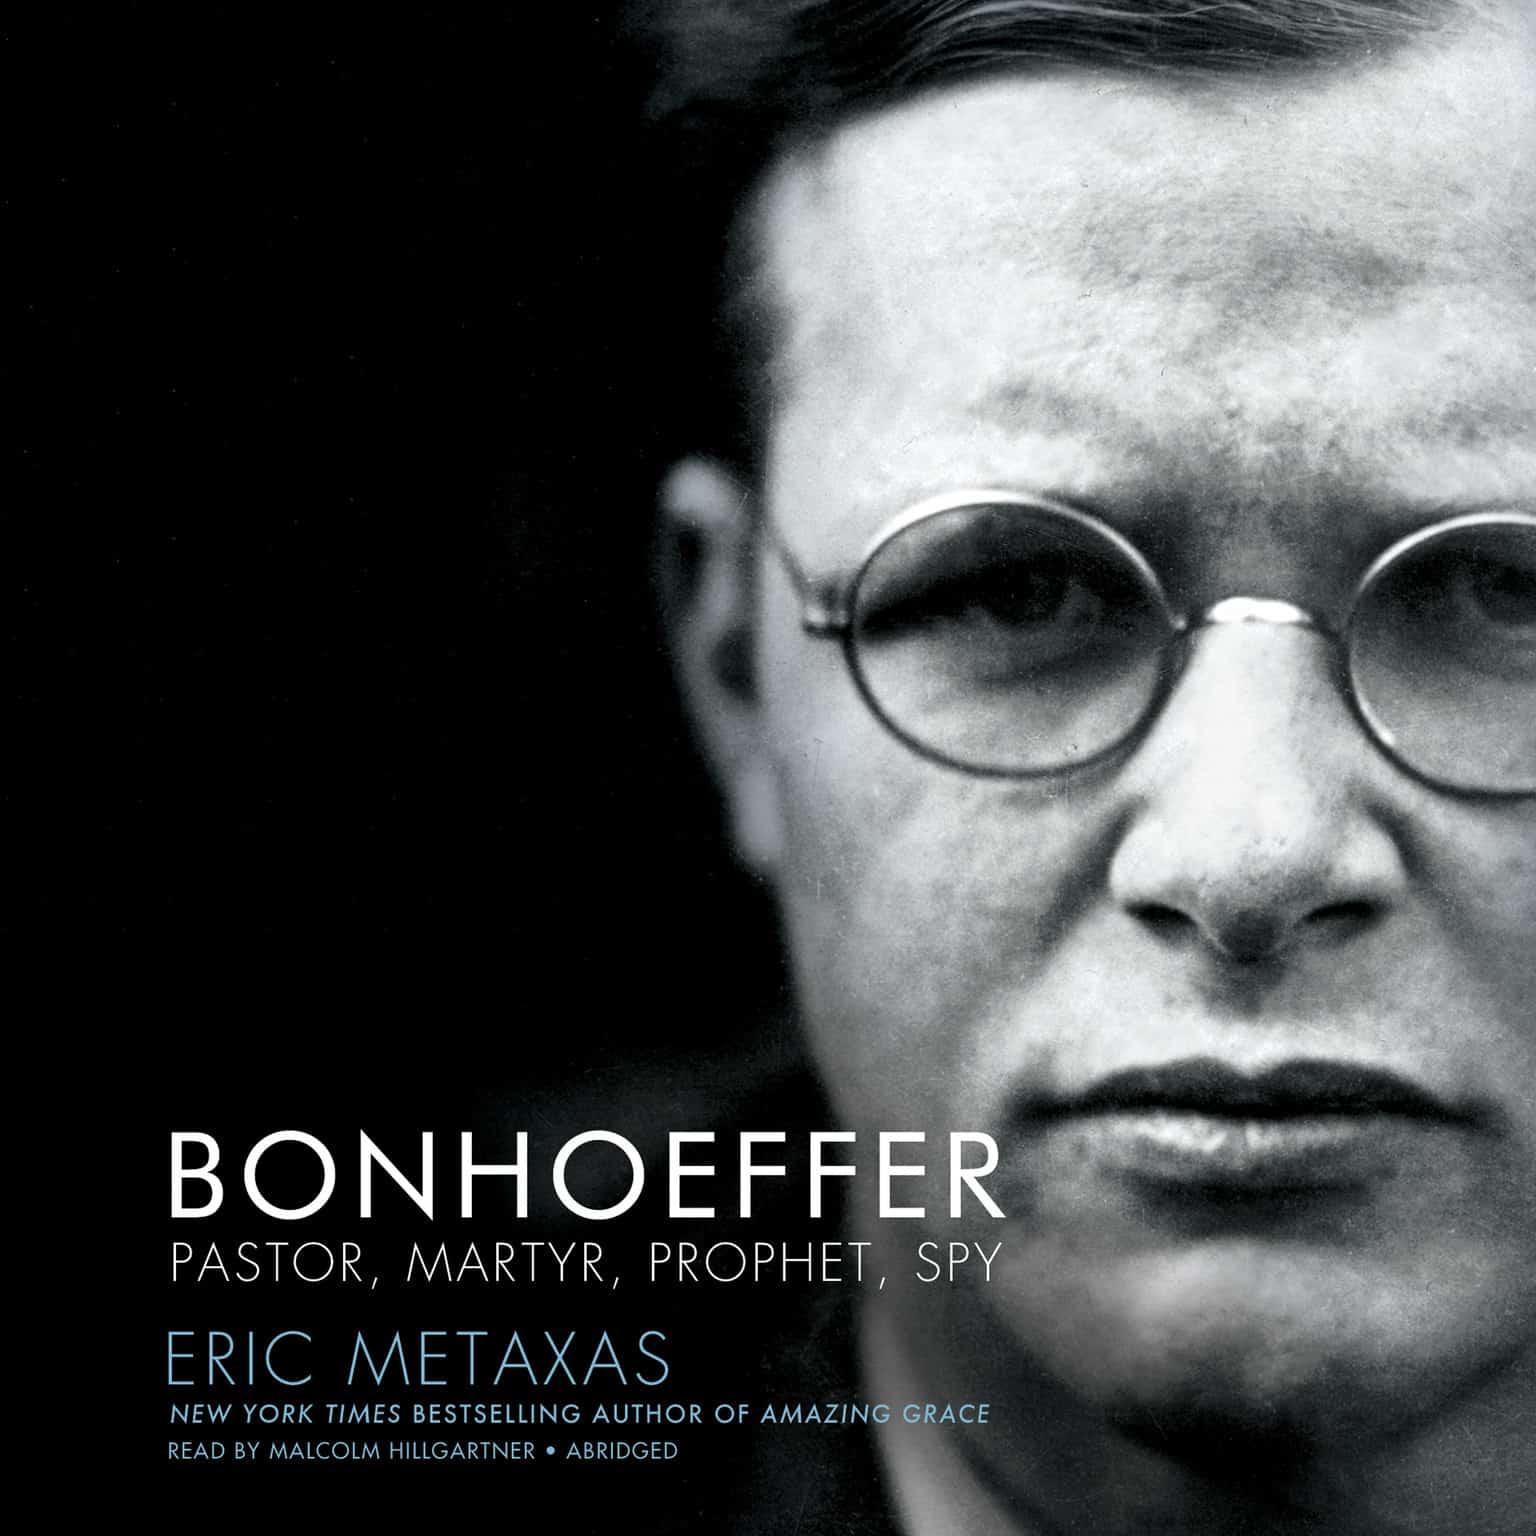 Bonhoeffer: Pastor, Martyr, Prophet, Spy – biography